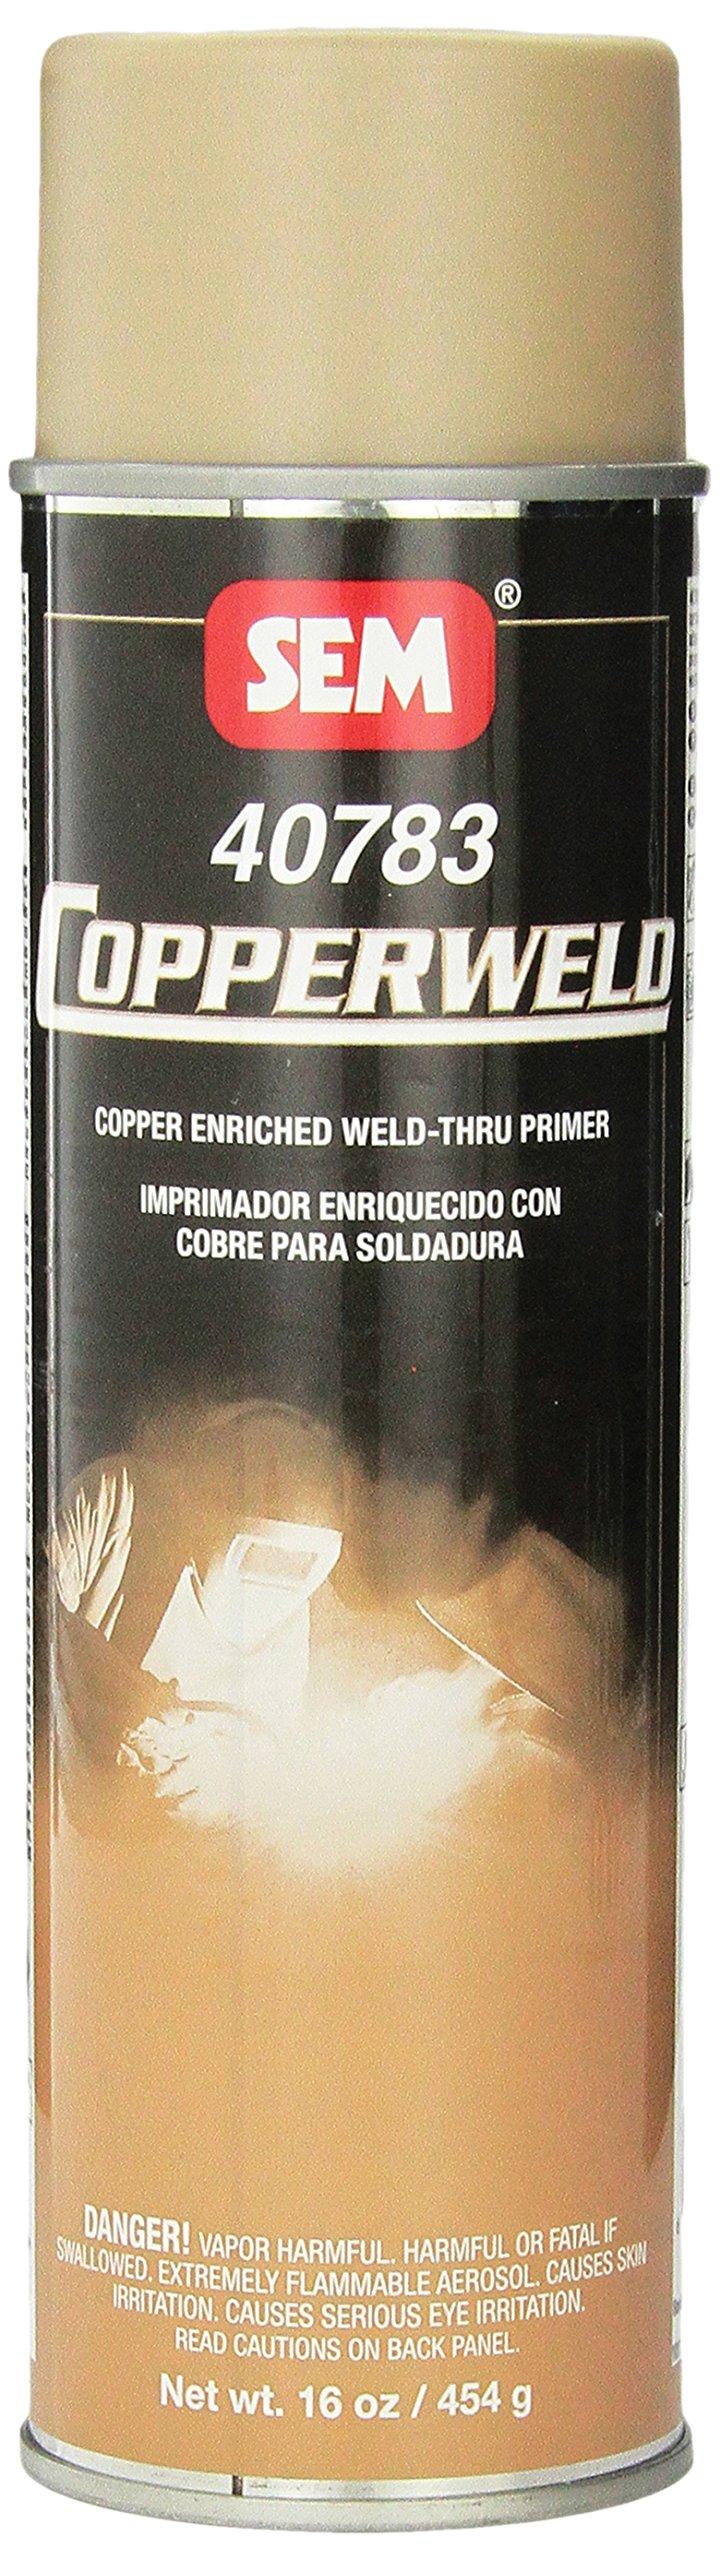 SEM 40783 Copperweld Weld-Thru Primer - 16 oz.